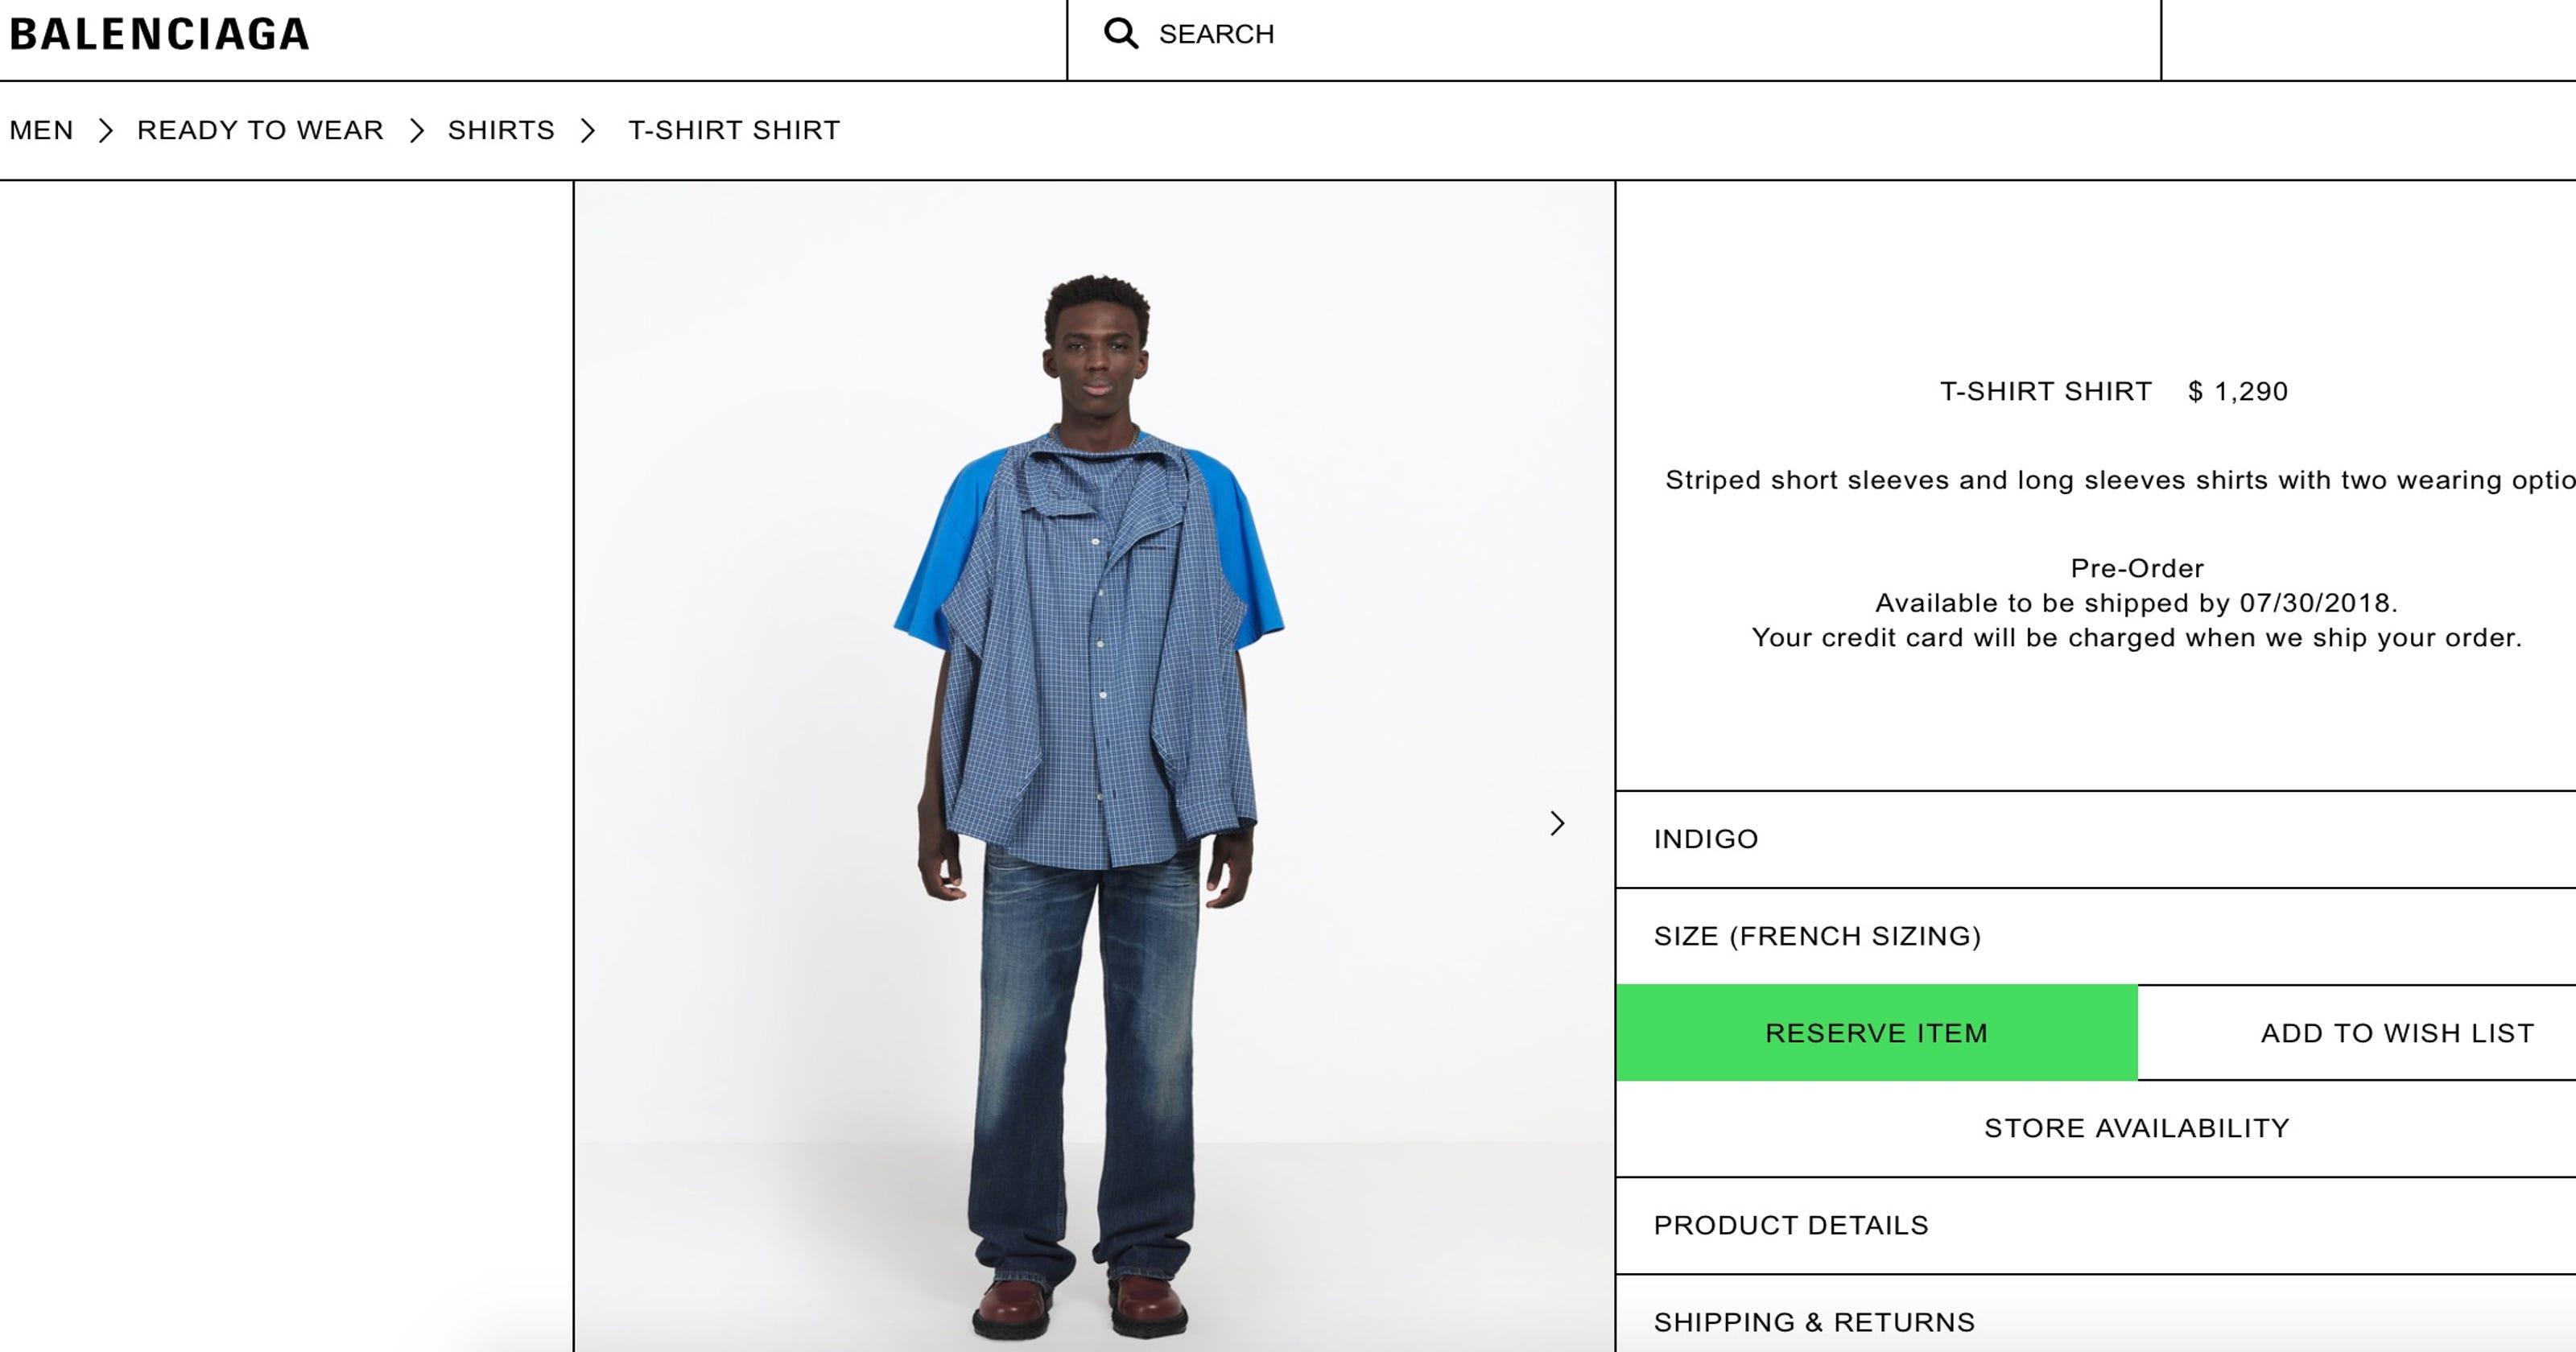 Balenciaga T-shirt Shirt, Double Shirt are making the